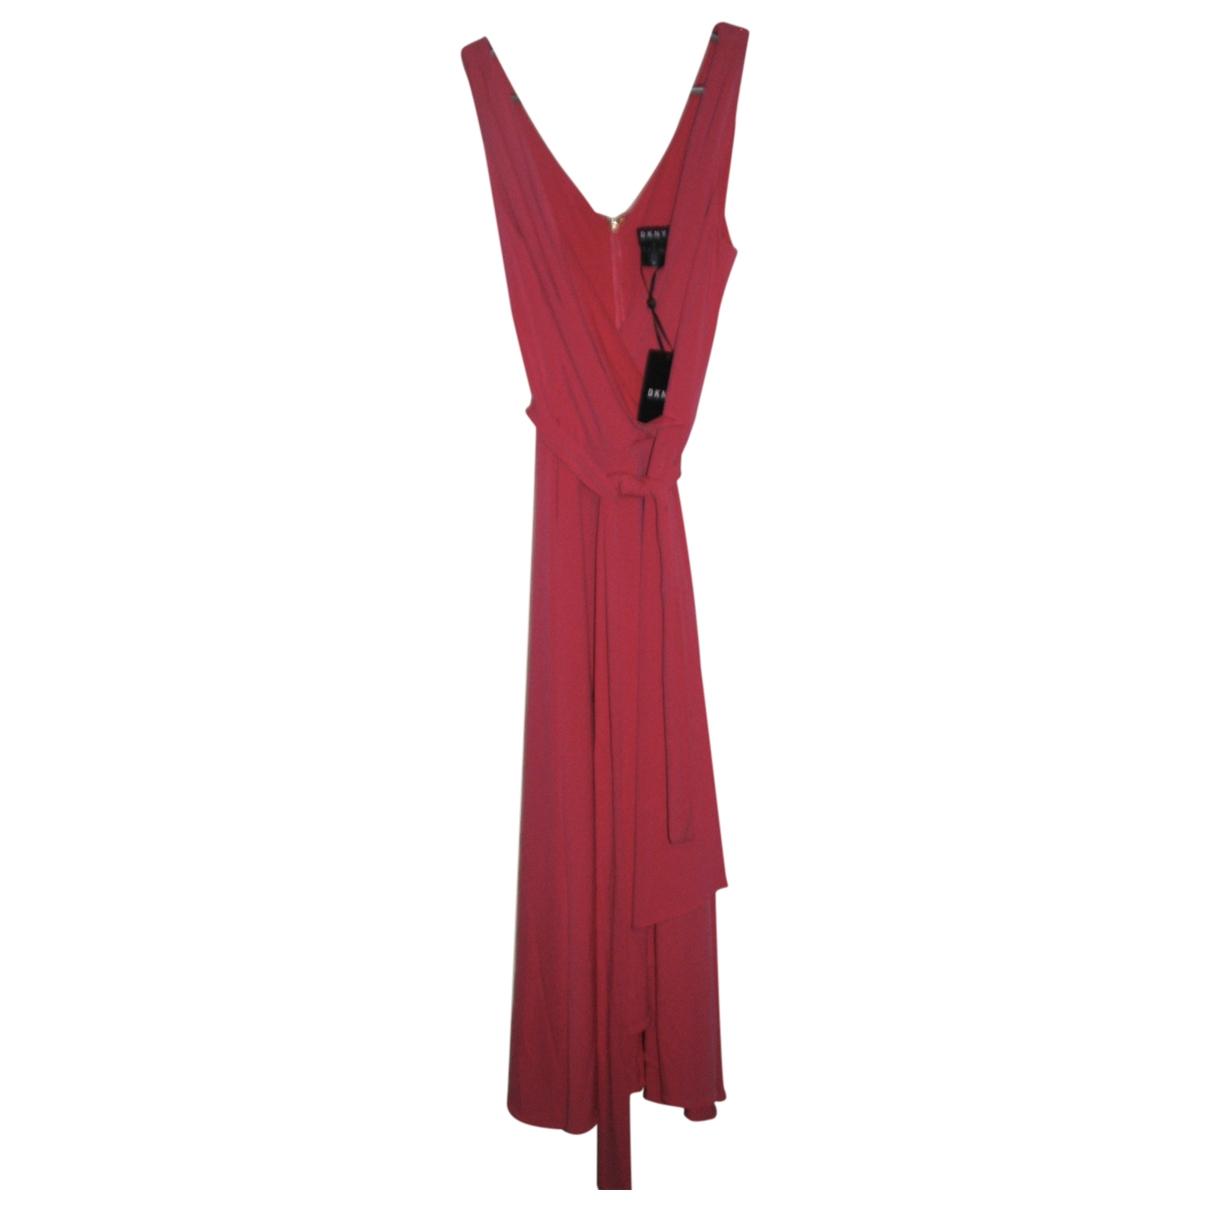 Dkny \N Pink dress for Women 6 US